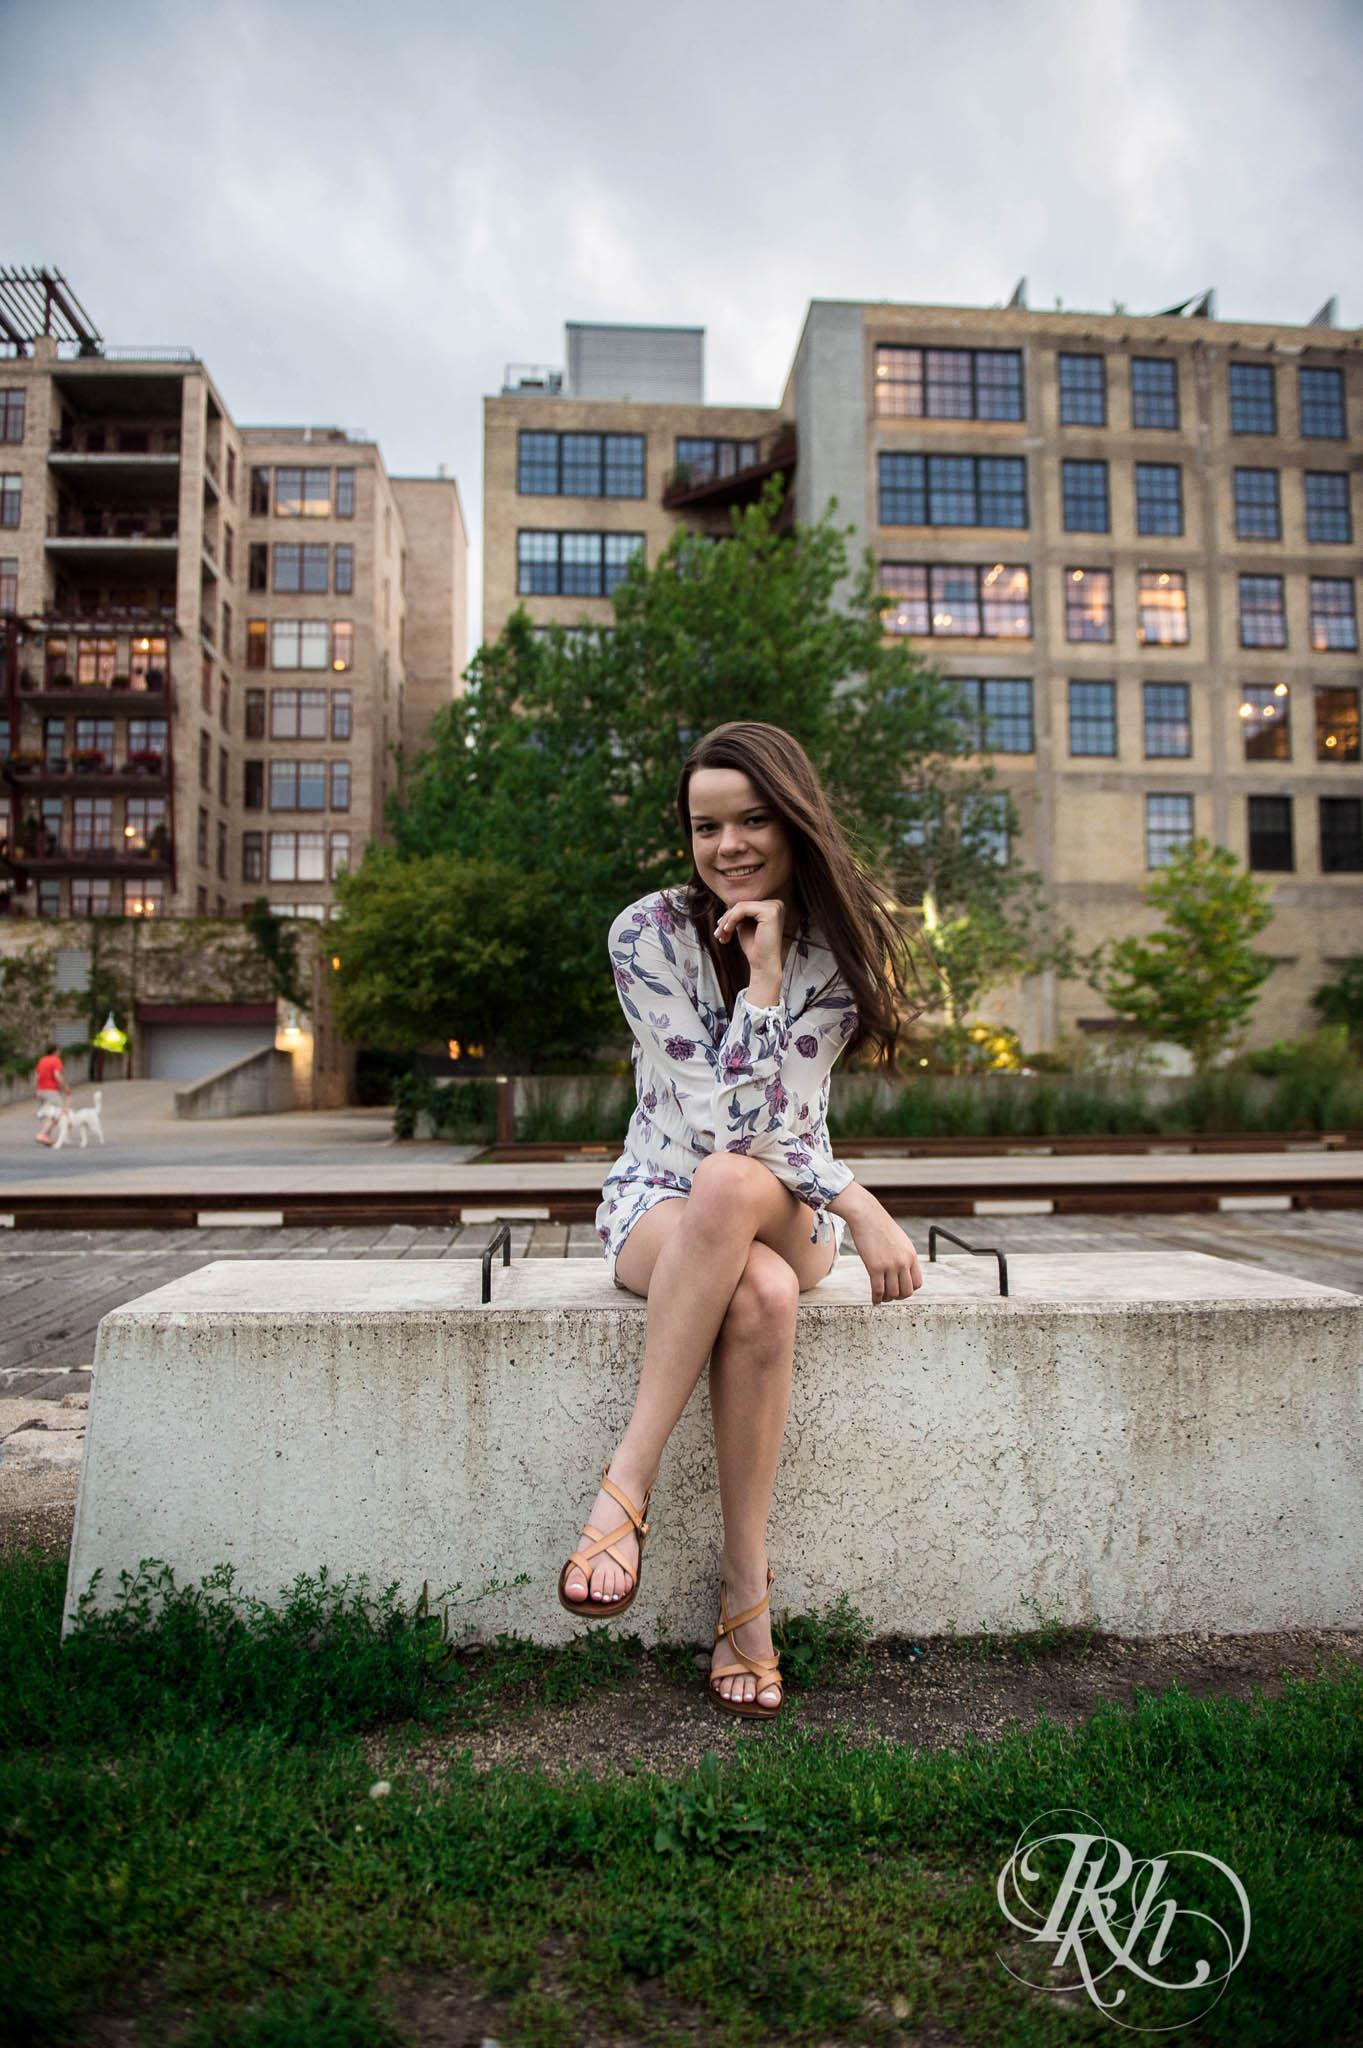 Rachel - Minnesota Senior Photography - Mill City Ruins - RKH Images  (7 of 8).jpg